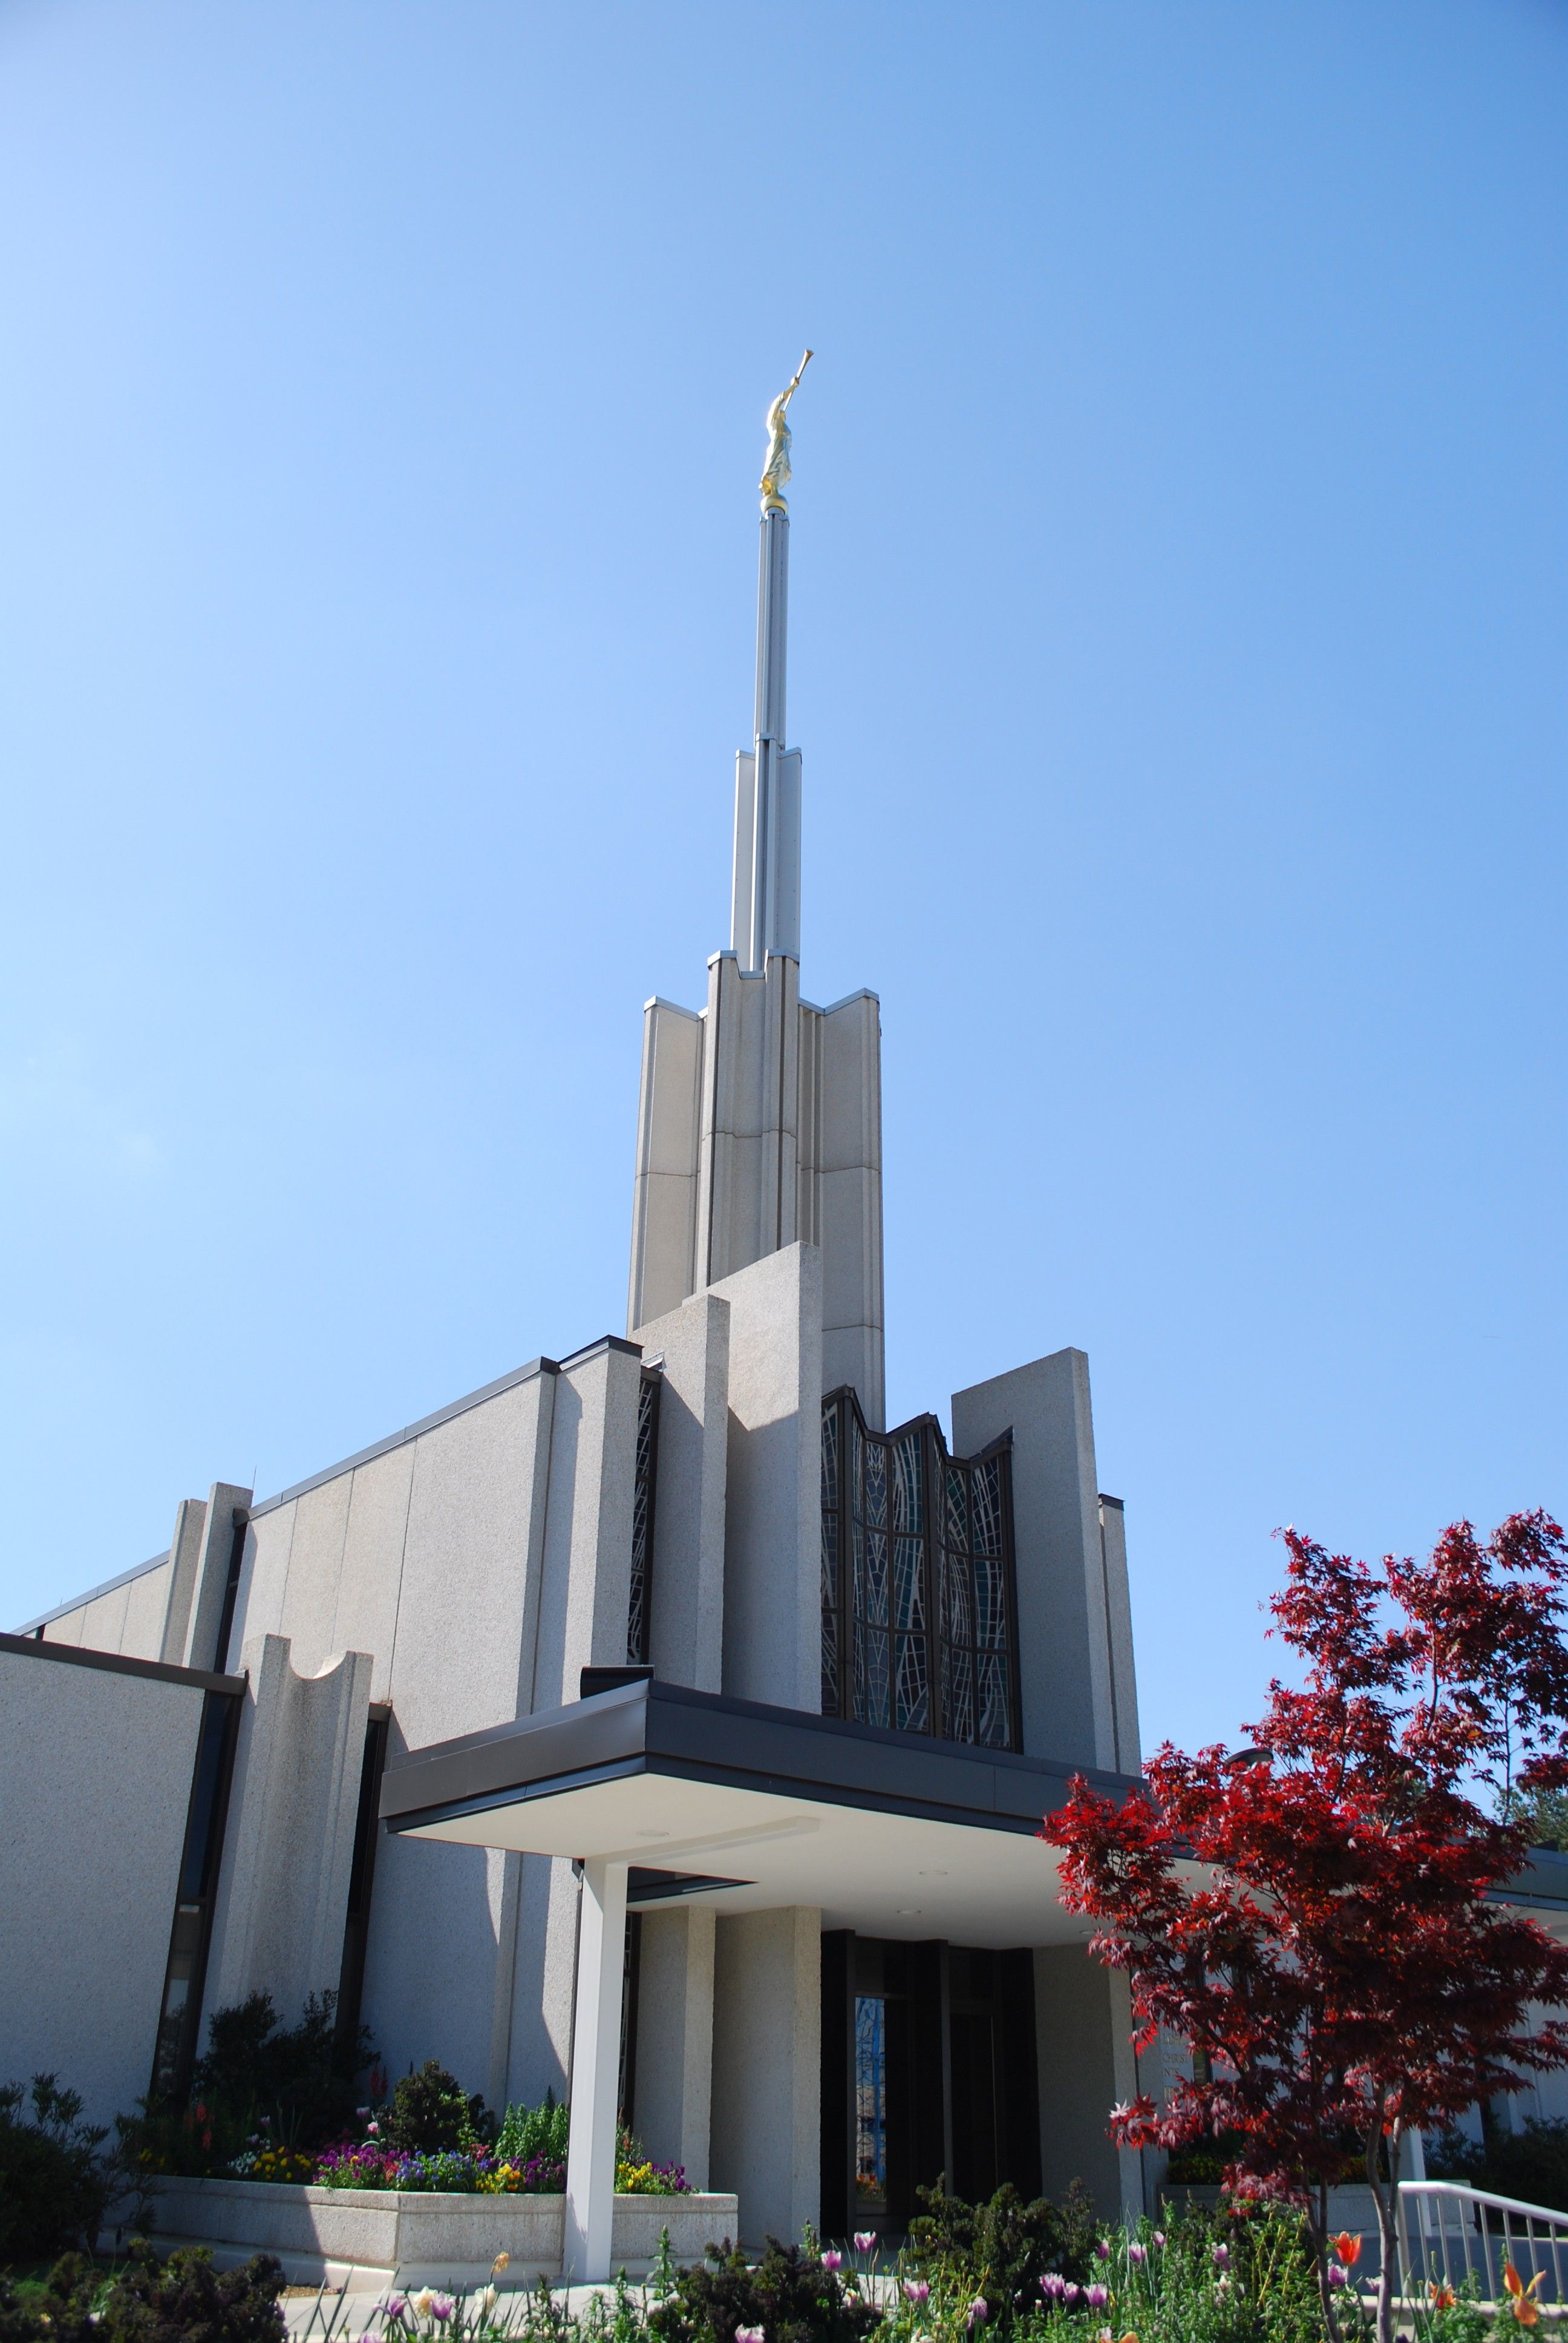 A view of the main entrance to the Atlanta Georgia Temple.